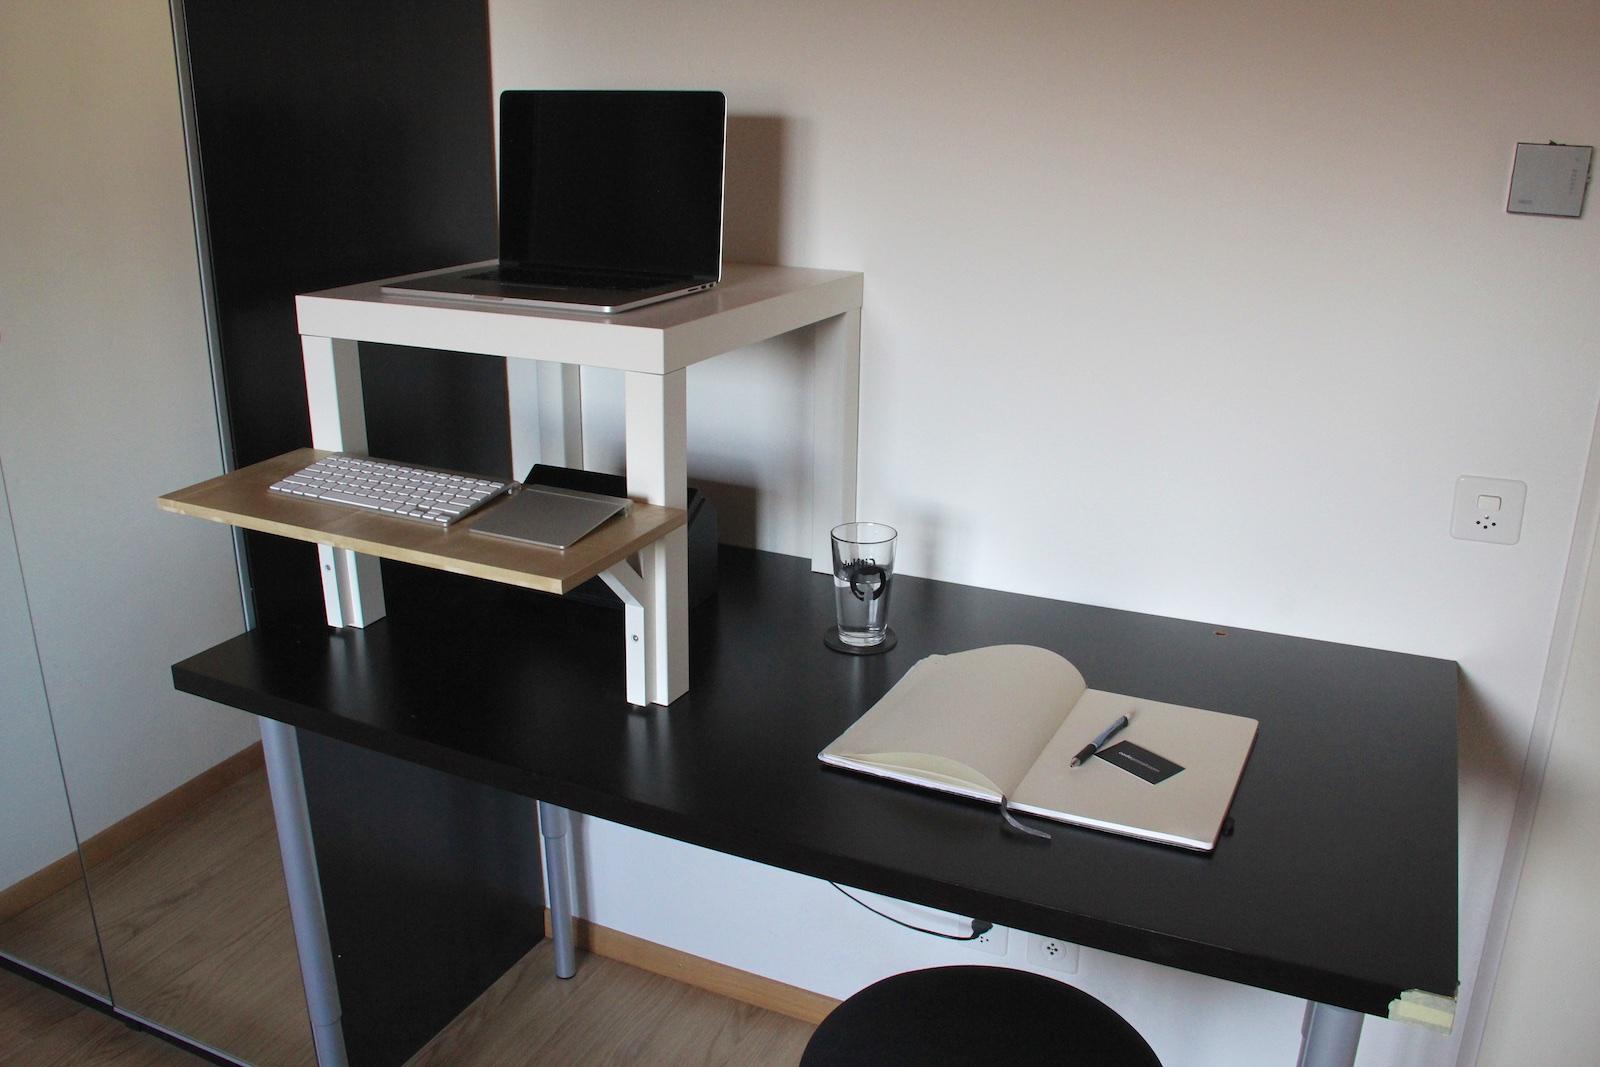 Standing desk and normal desk, side by side